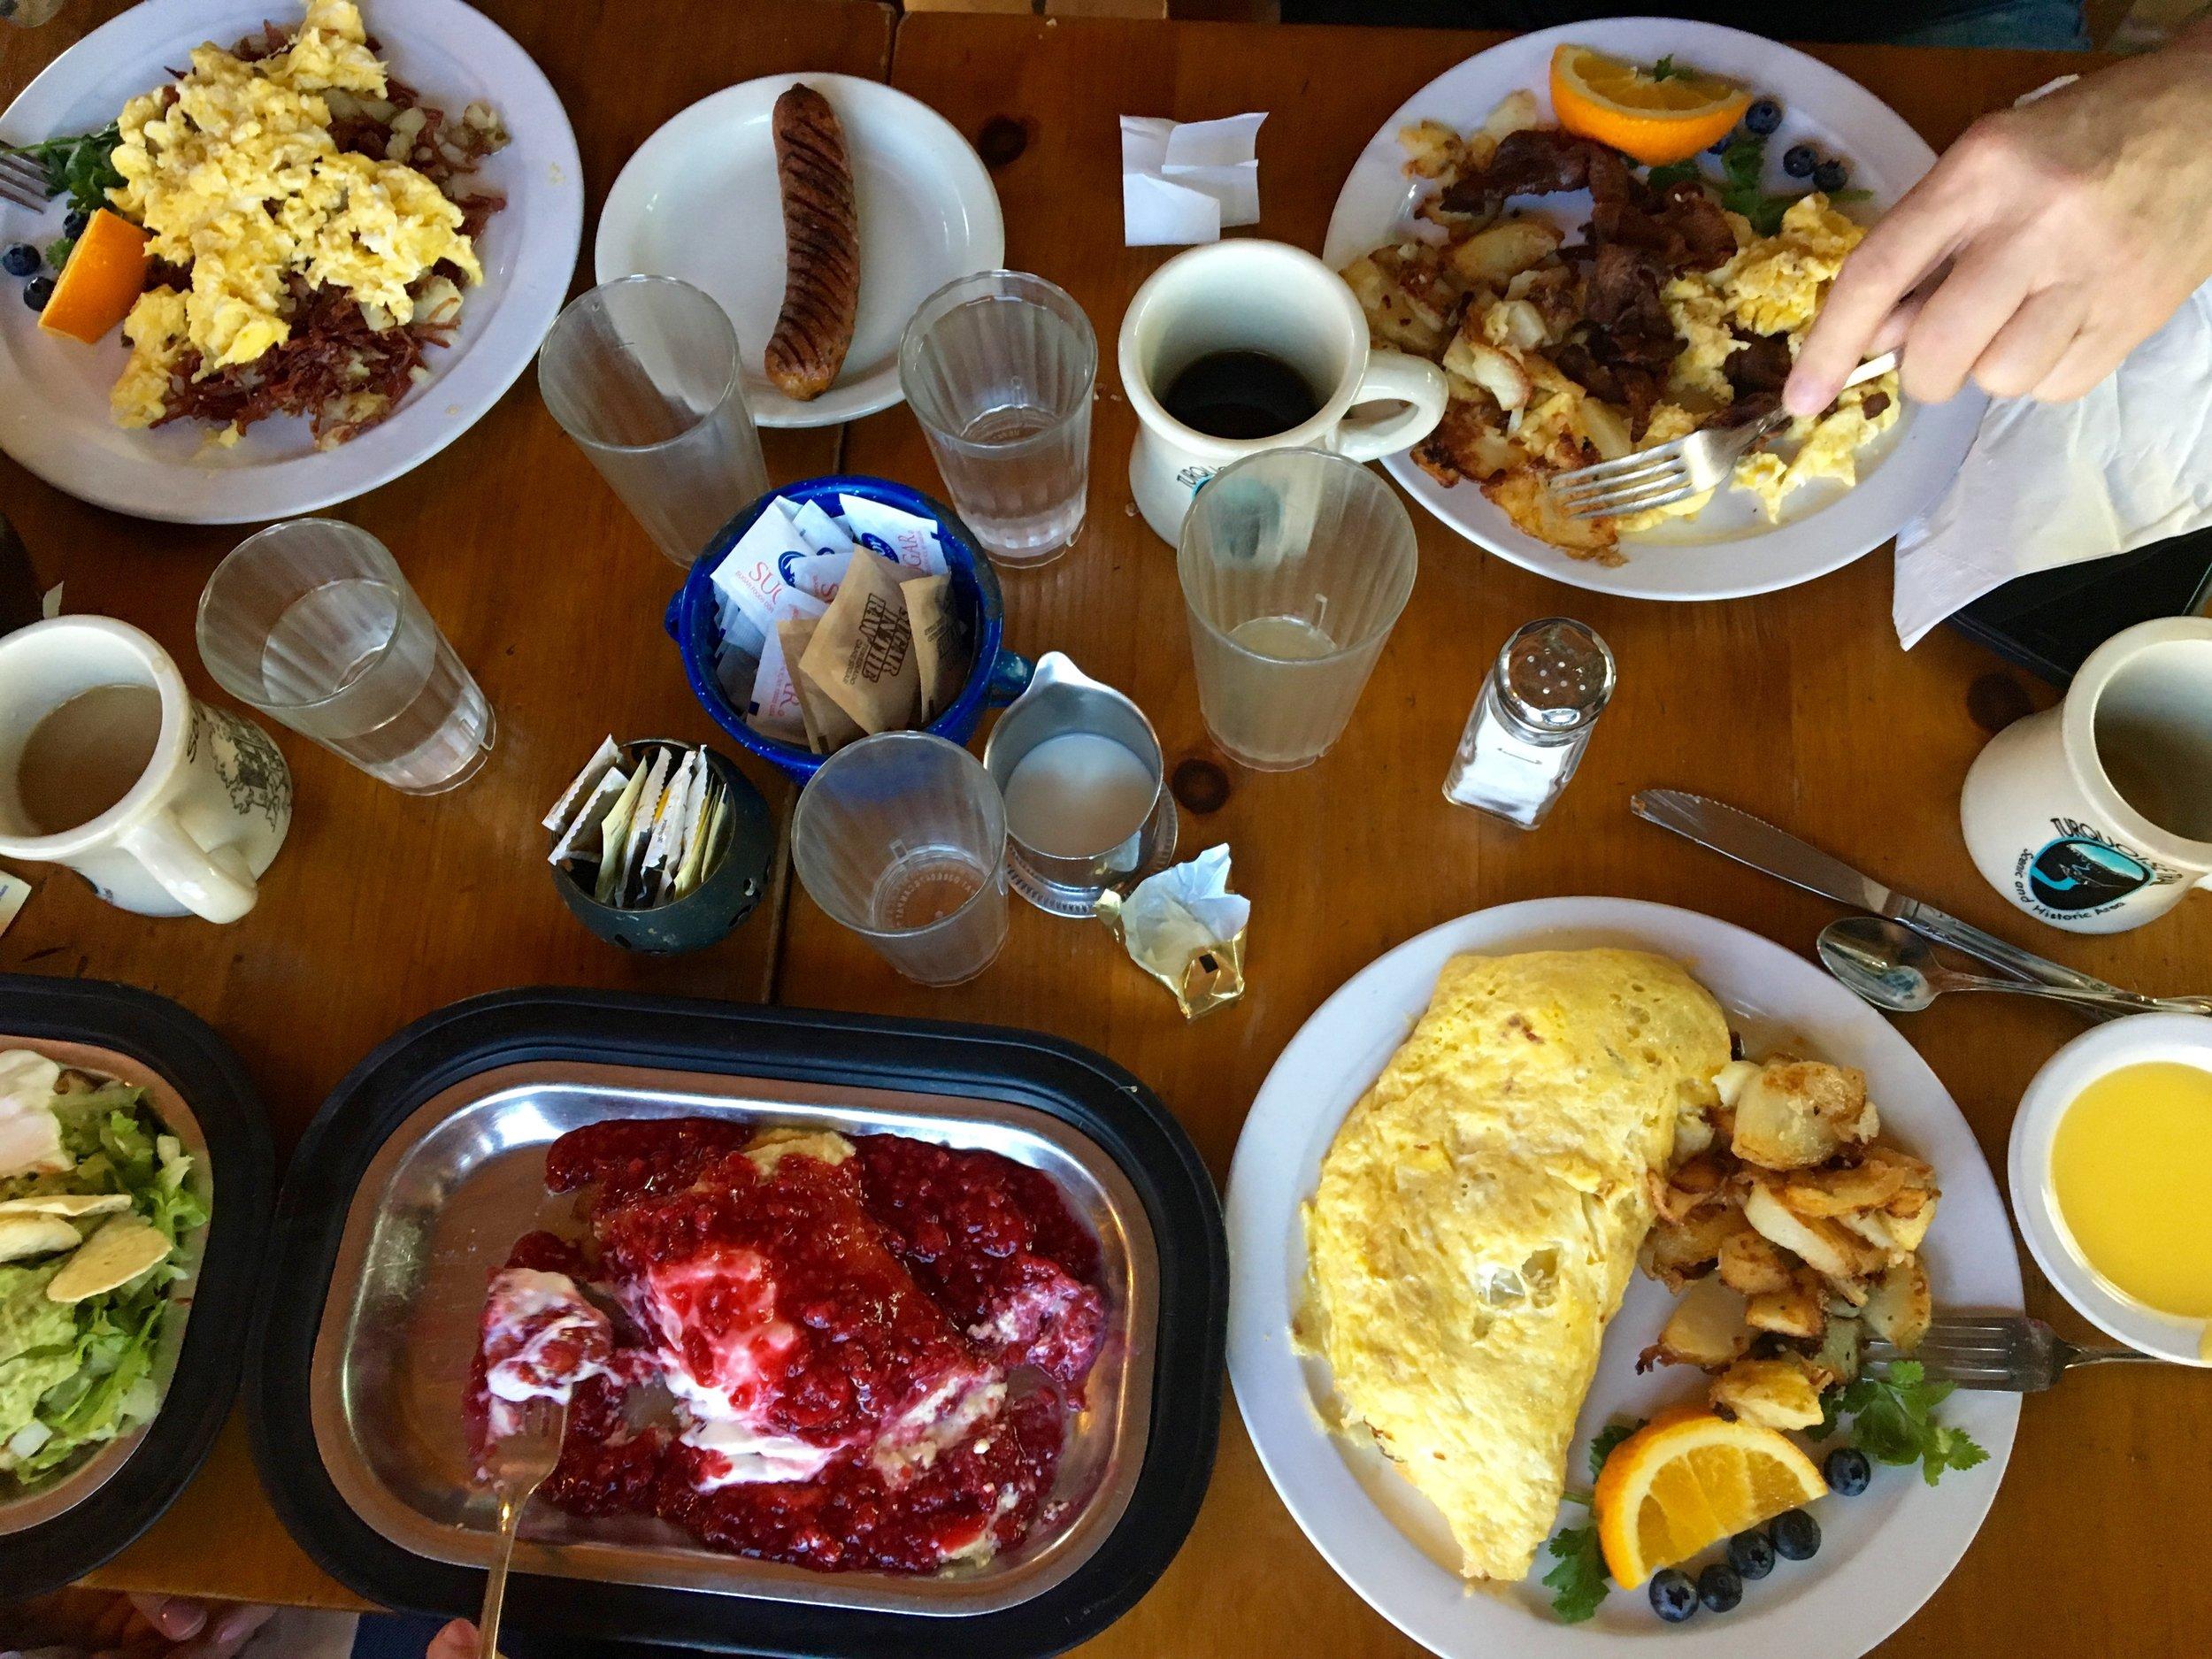 Seriously amazing breakfast!